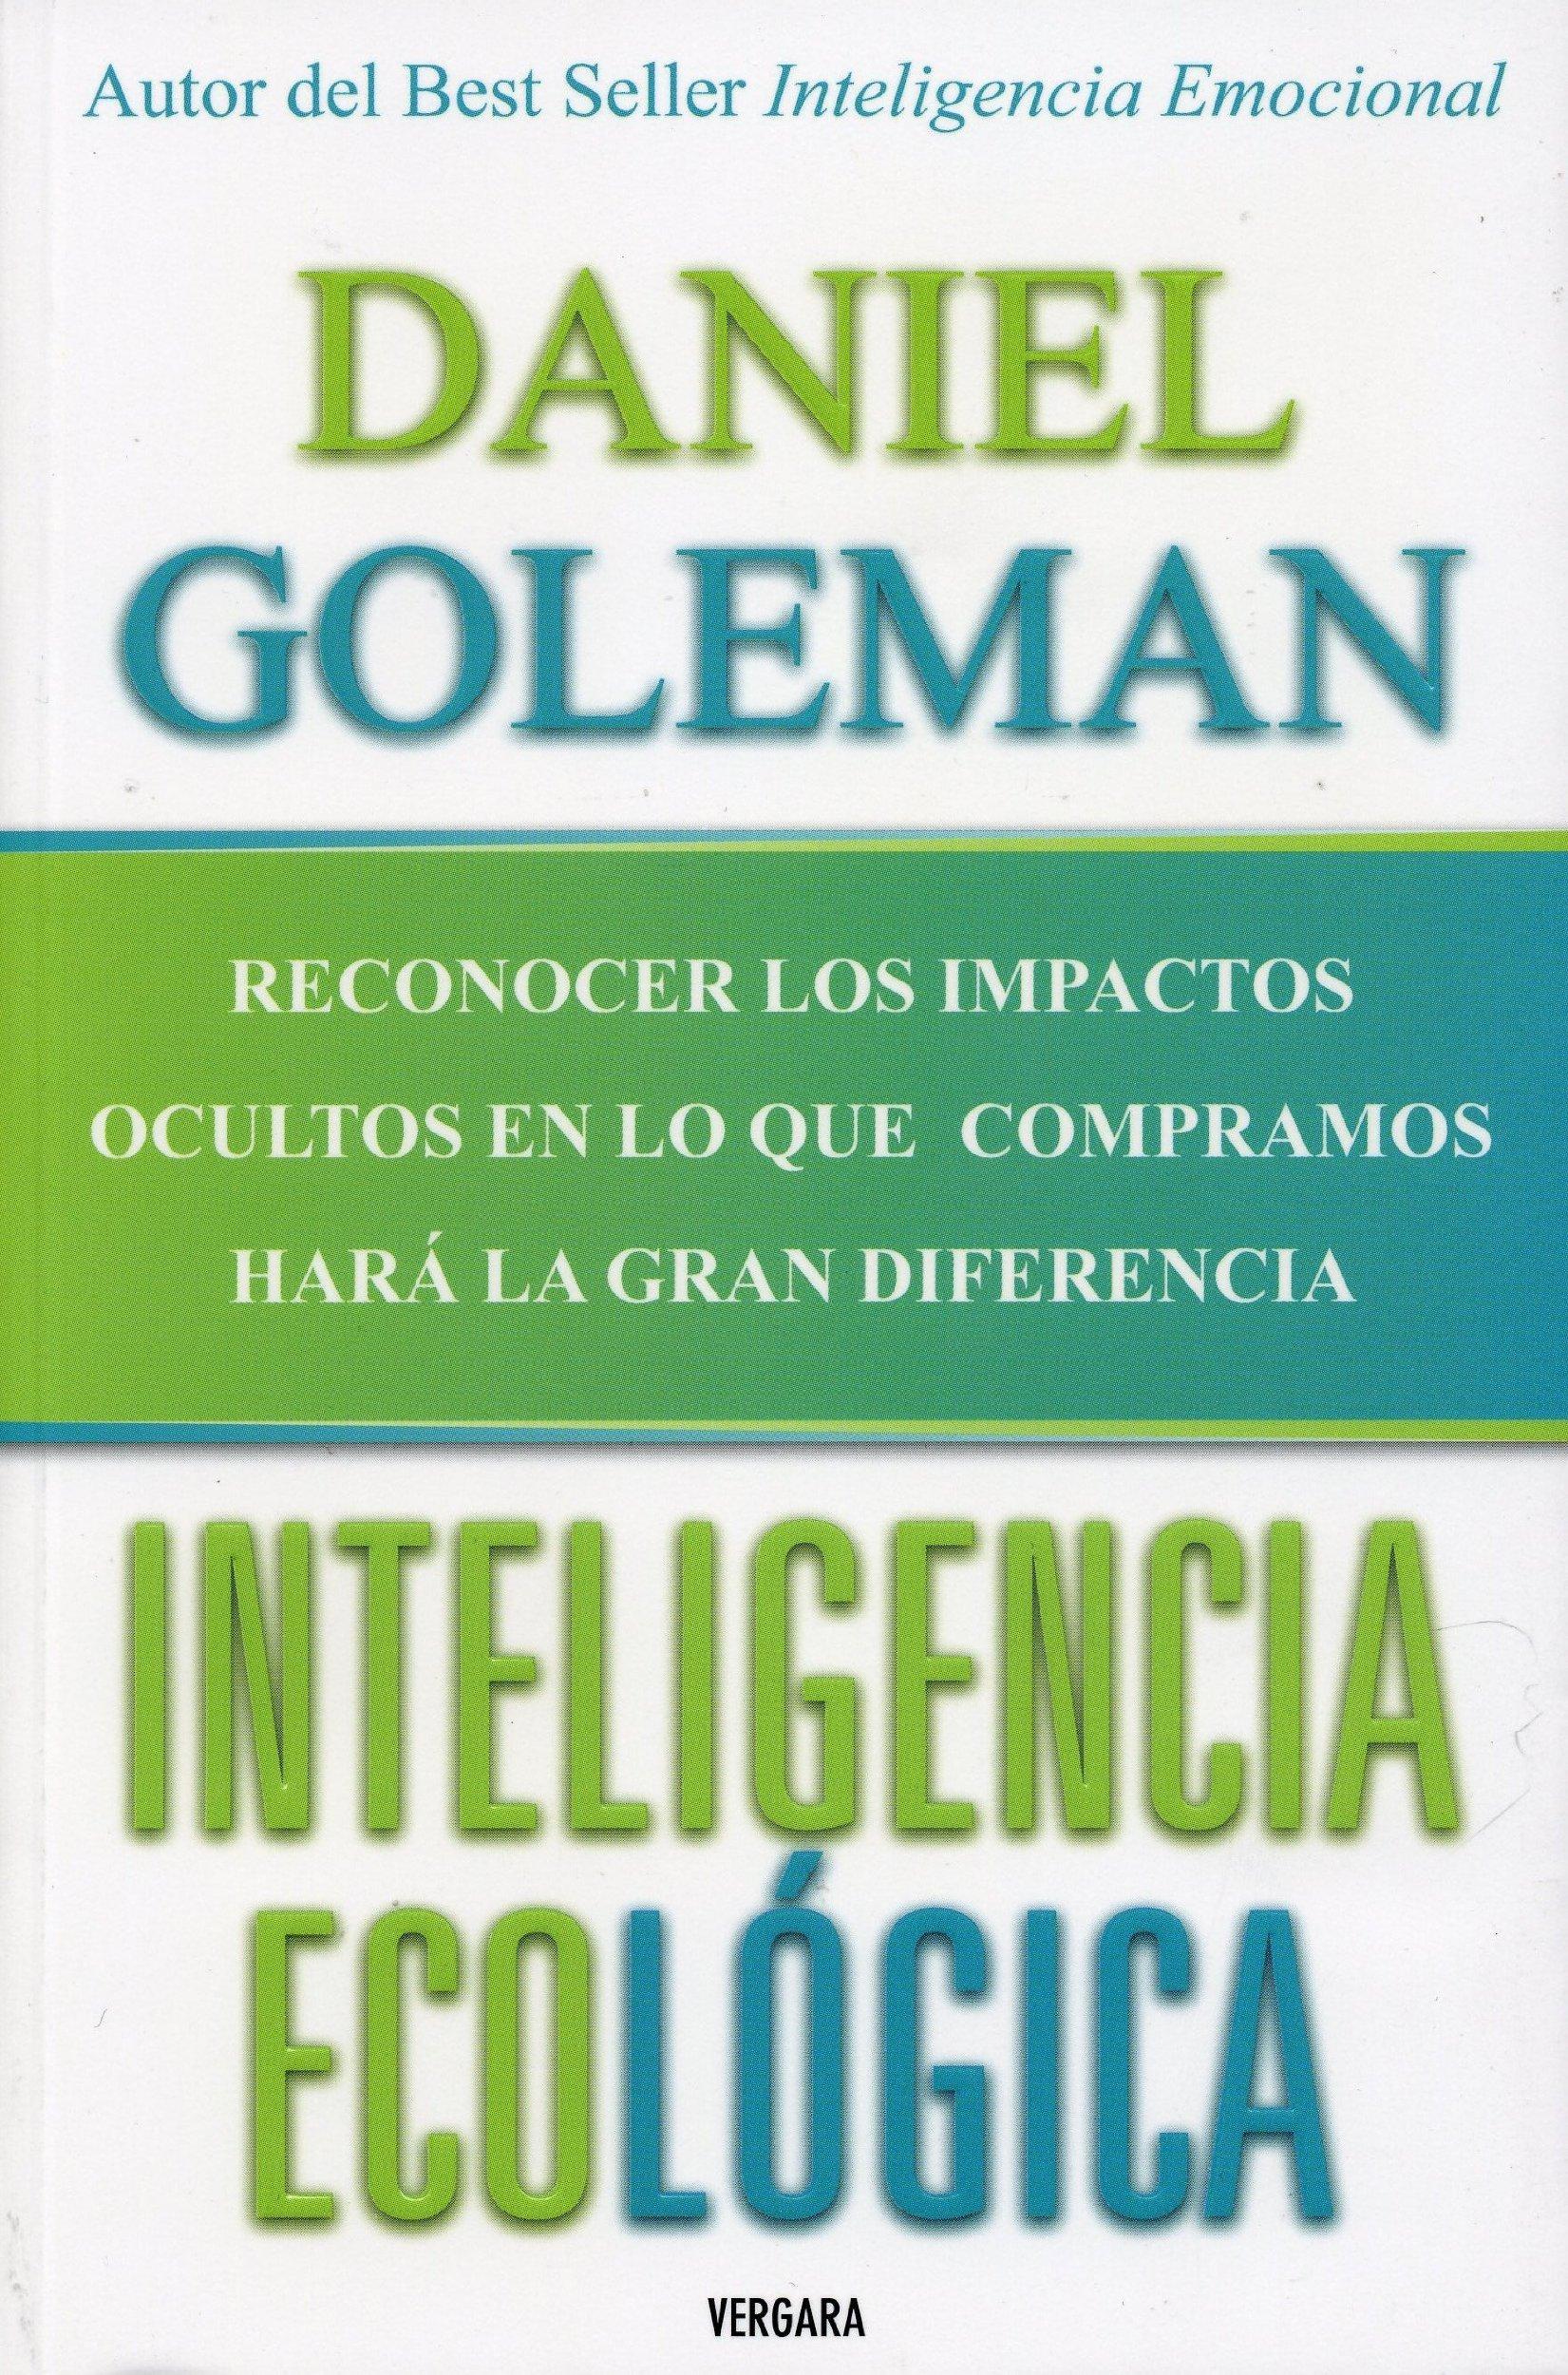 Inteligencia Ecologica (Spanish Edition) pdf